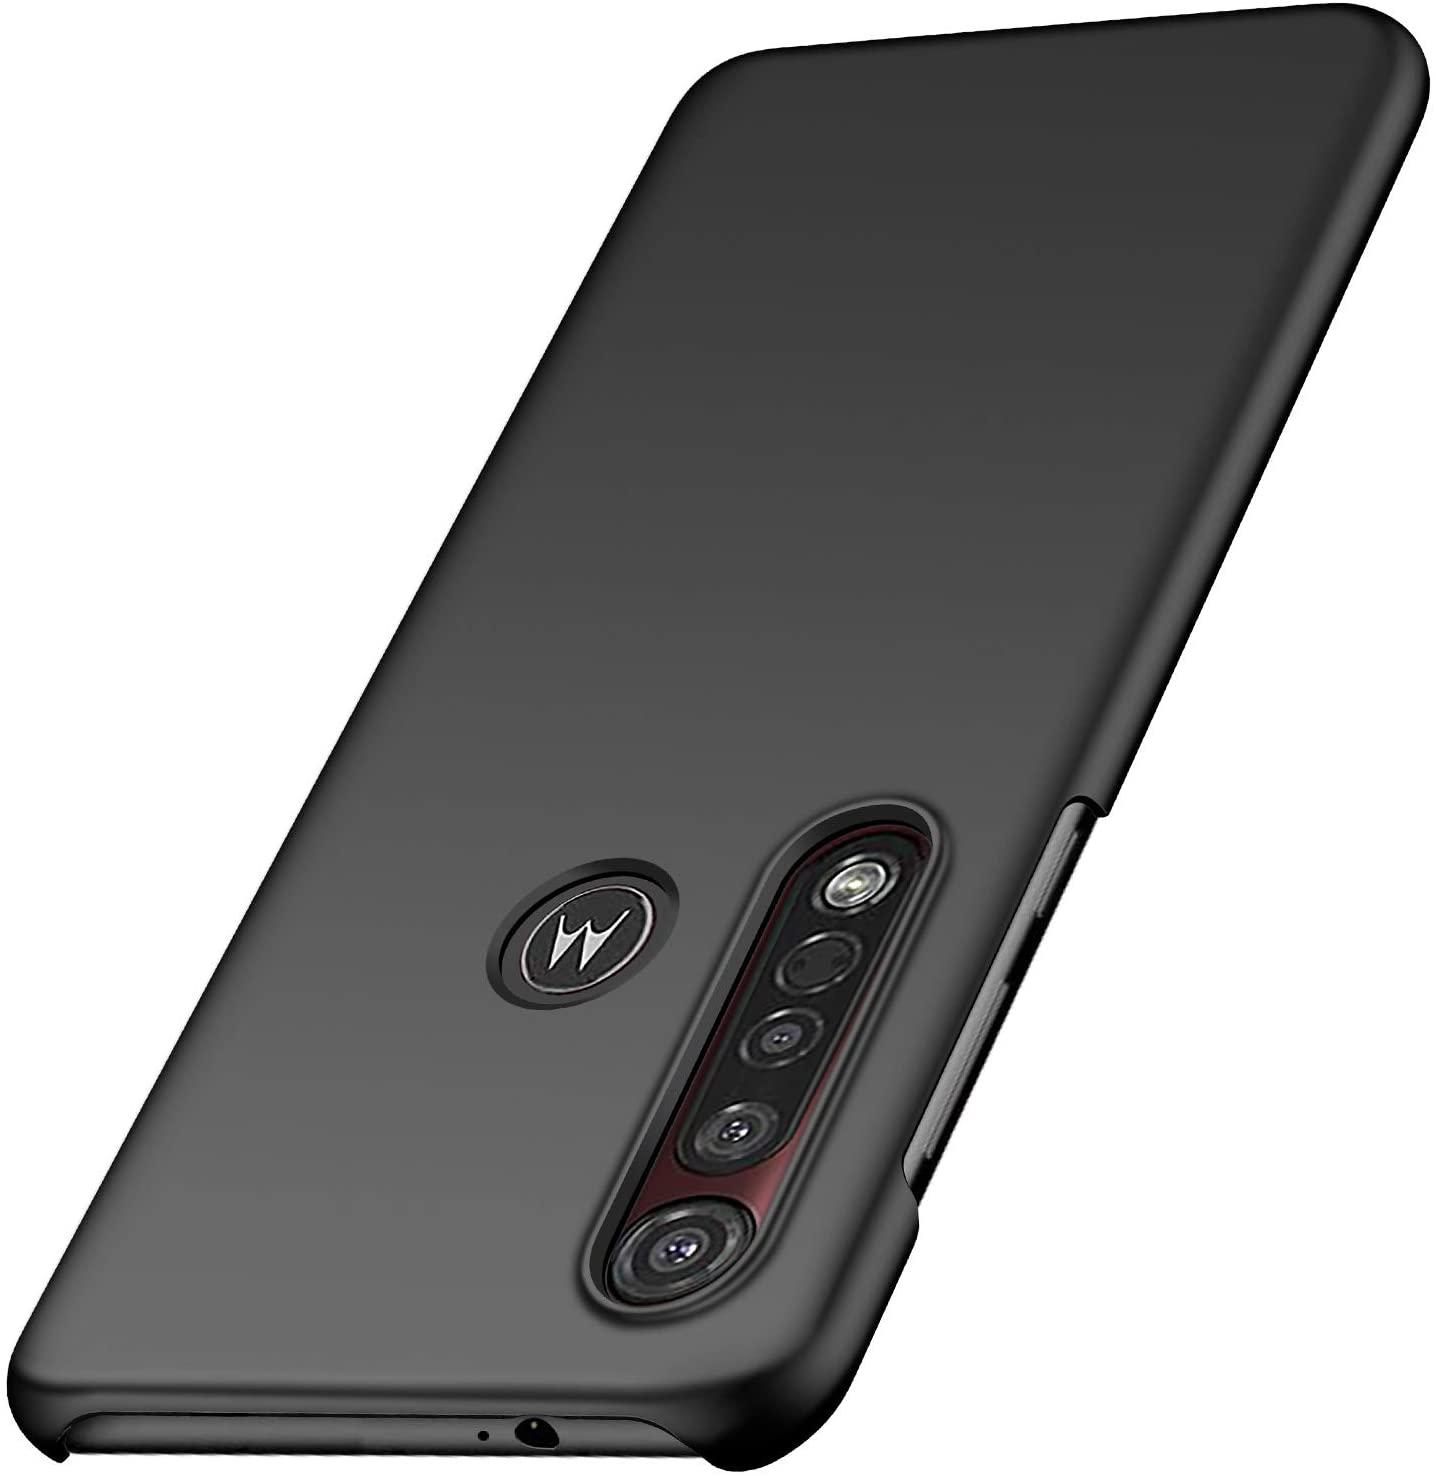 Yipmai Compatible with Motorola Moto G8 Plus Case, 0.03 Inch Ultra Thin Ultra Slim Hard PC Plastic Protective Case for Motorola Moto G8 Plus (Smooth Black)